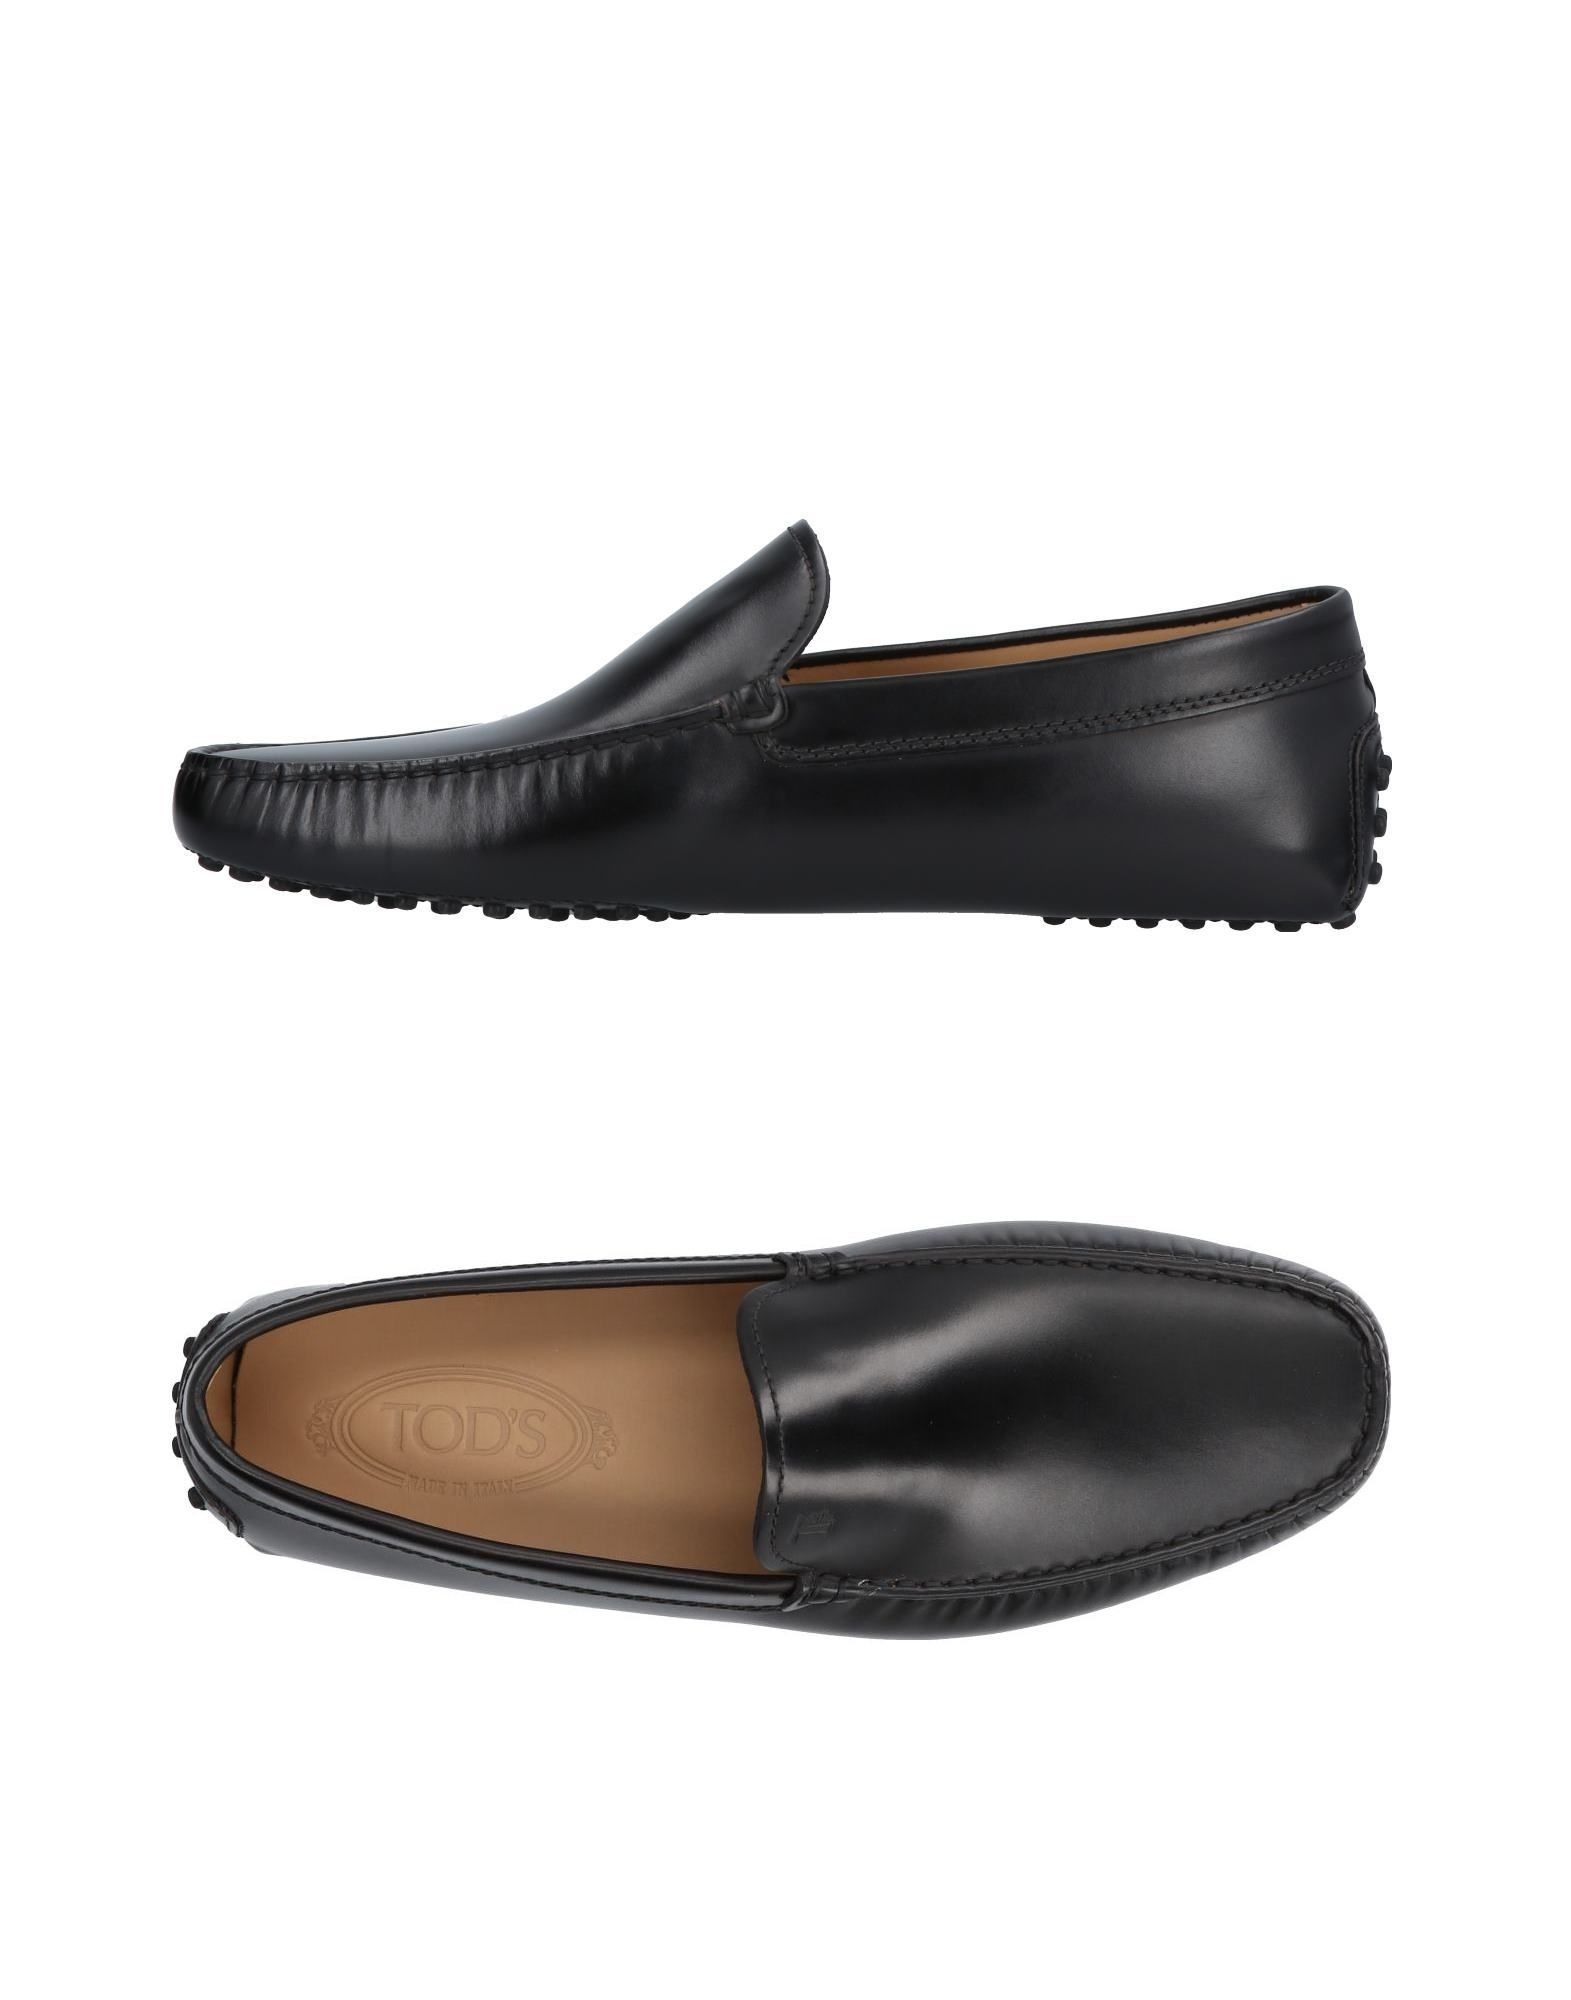 Tod's Gute Mokassins Herren  11413442CG Gute Tod's Qualität beliebte Schuhe b5c6c6